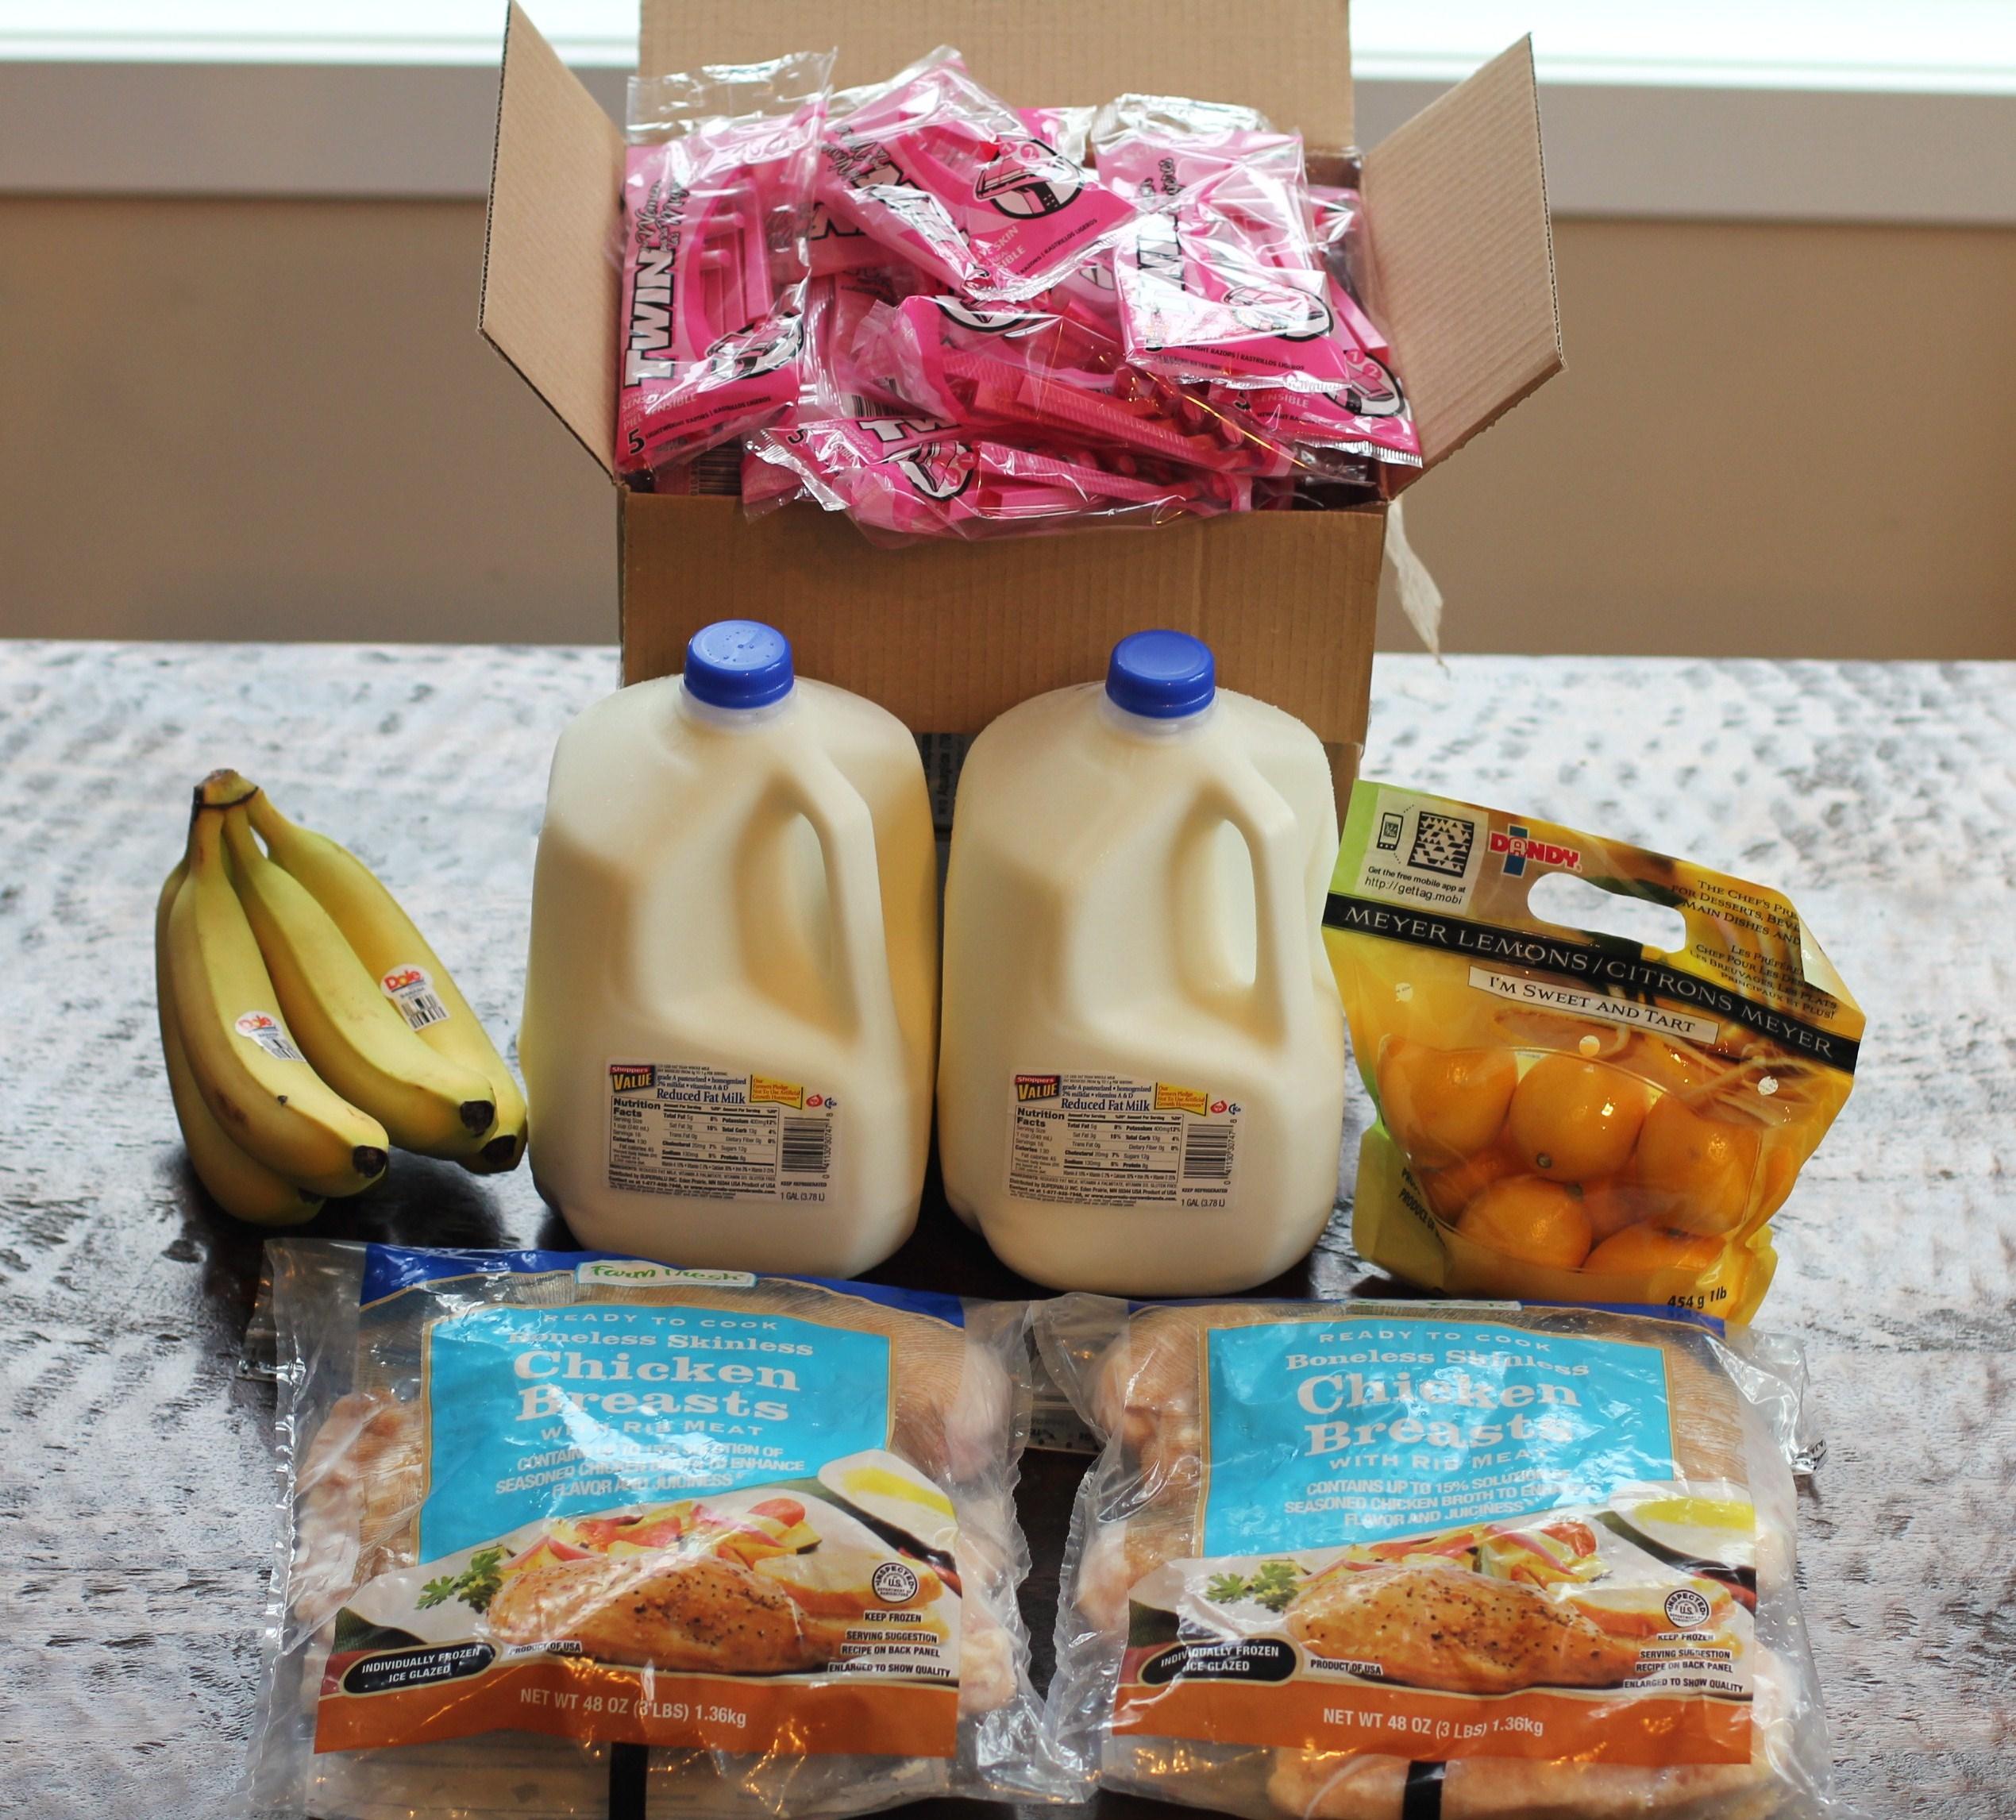 Mavis Scores FREE FOOD at Albertsons Again e Hundred Dollars